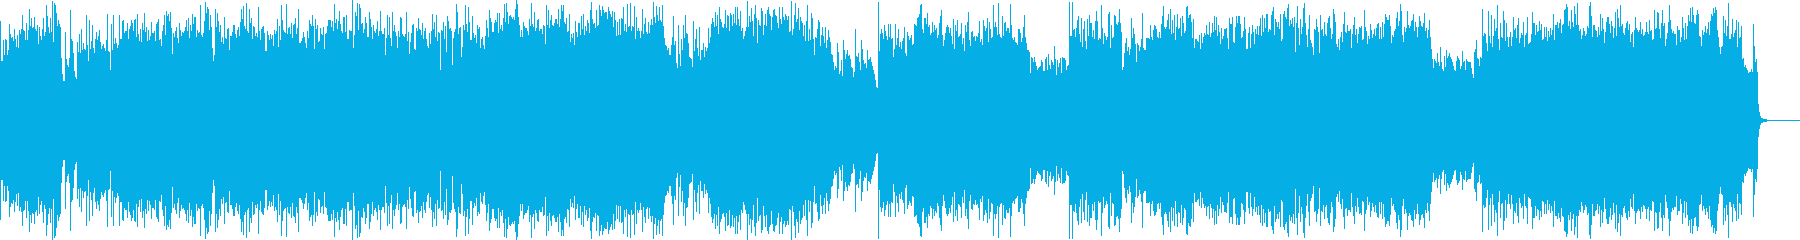 metalの再生済みの波形